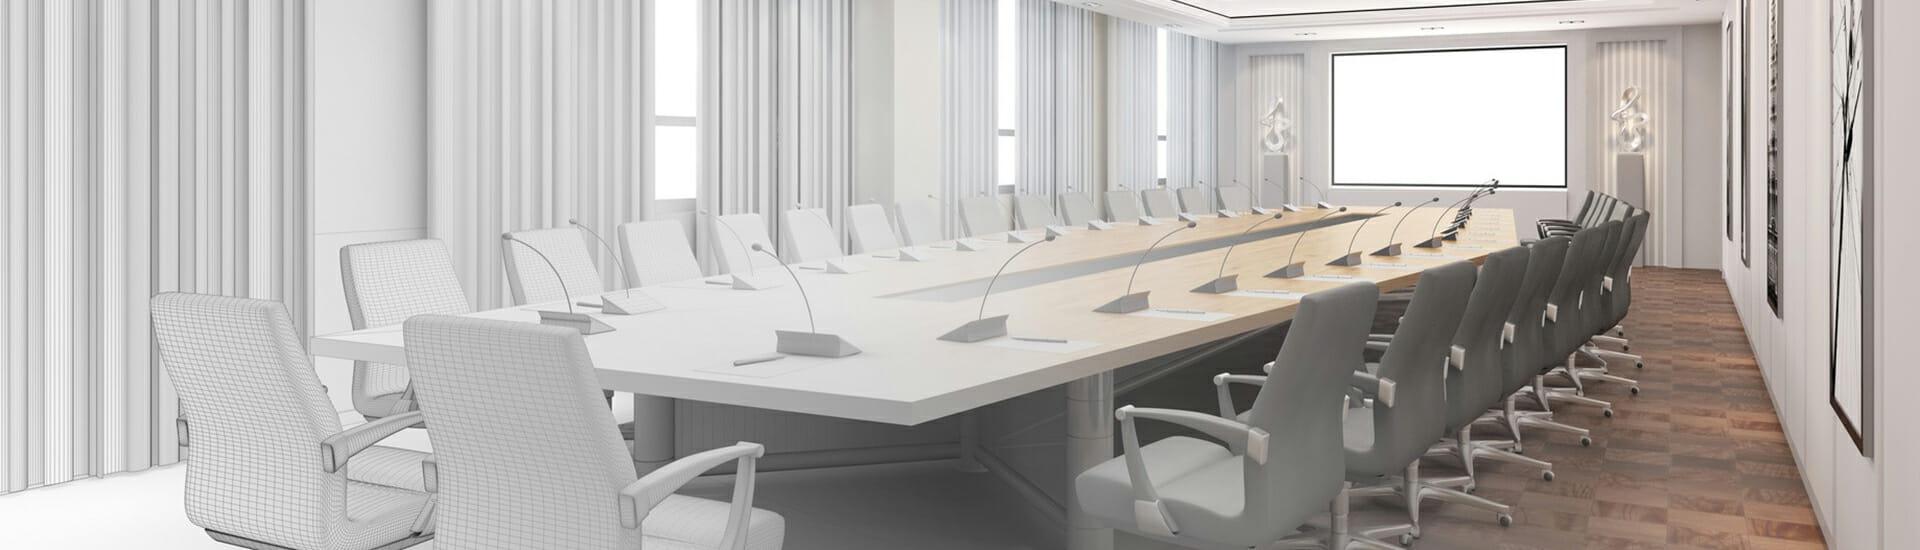 Raumgestaltung Konferenzraum